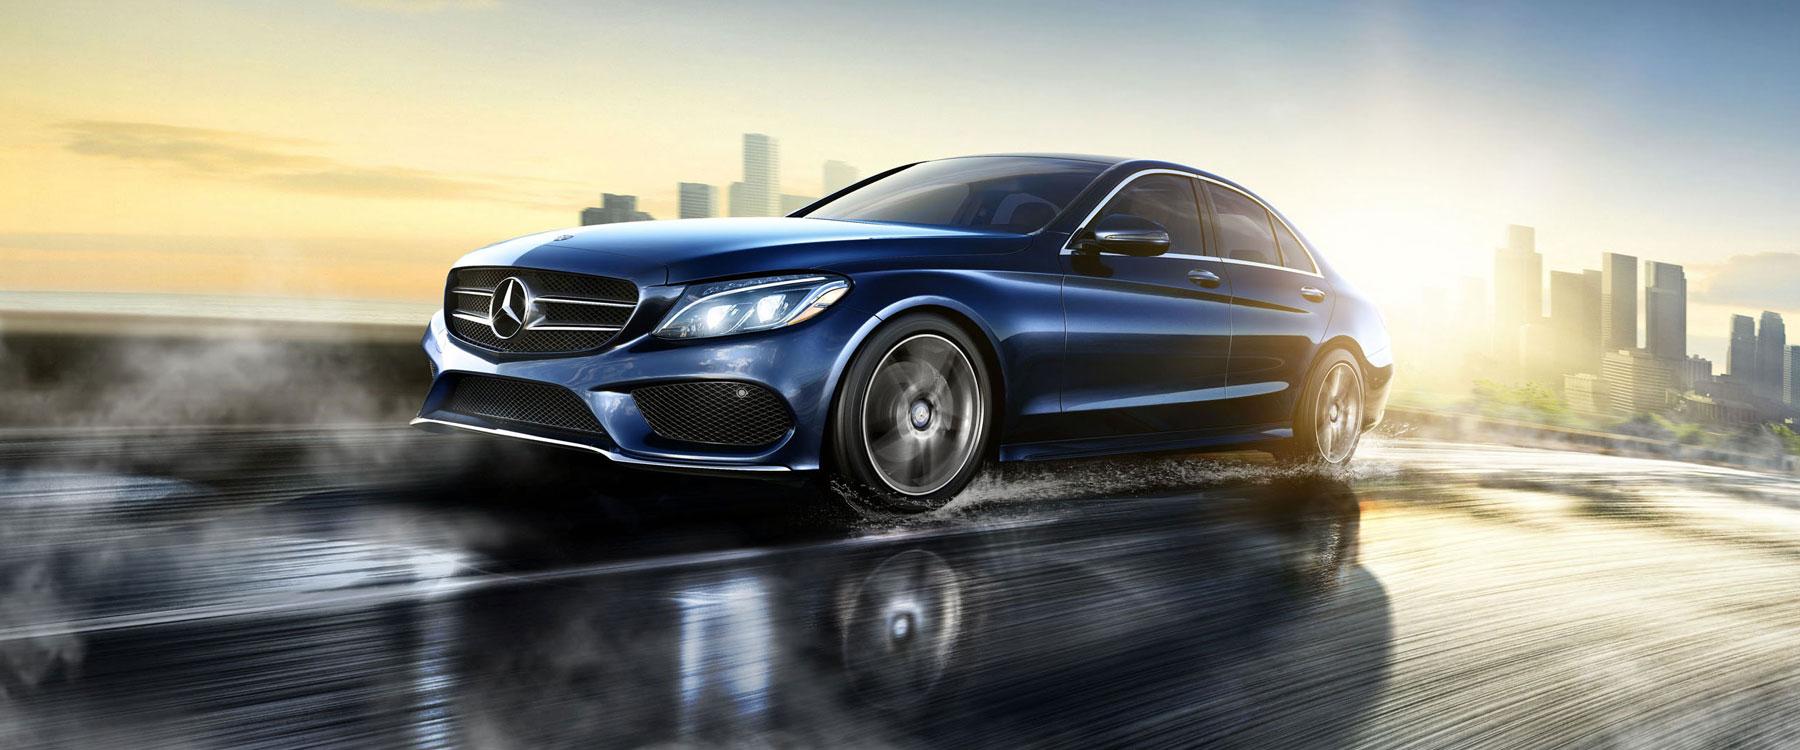 The lavish yet practical 2017 mercedes benz c 300 sedan for Mercedes benz lease return